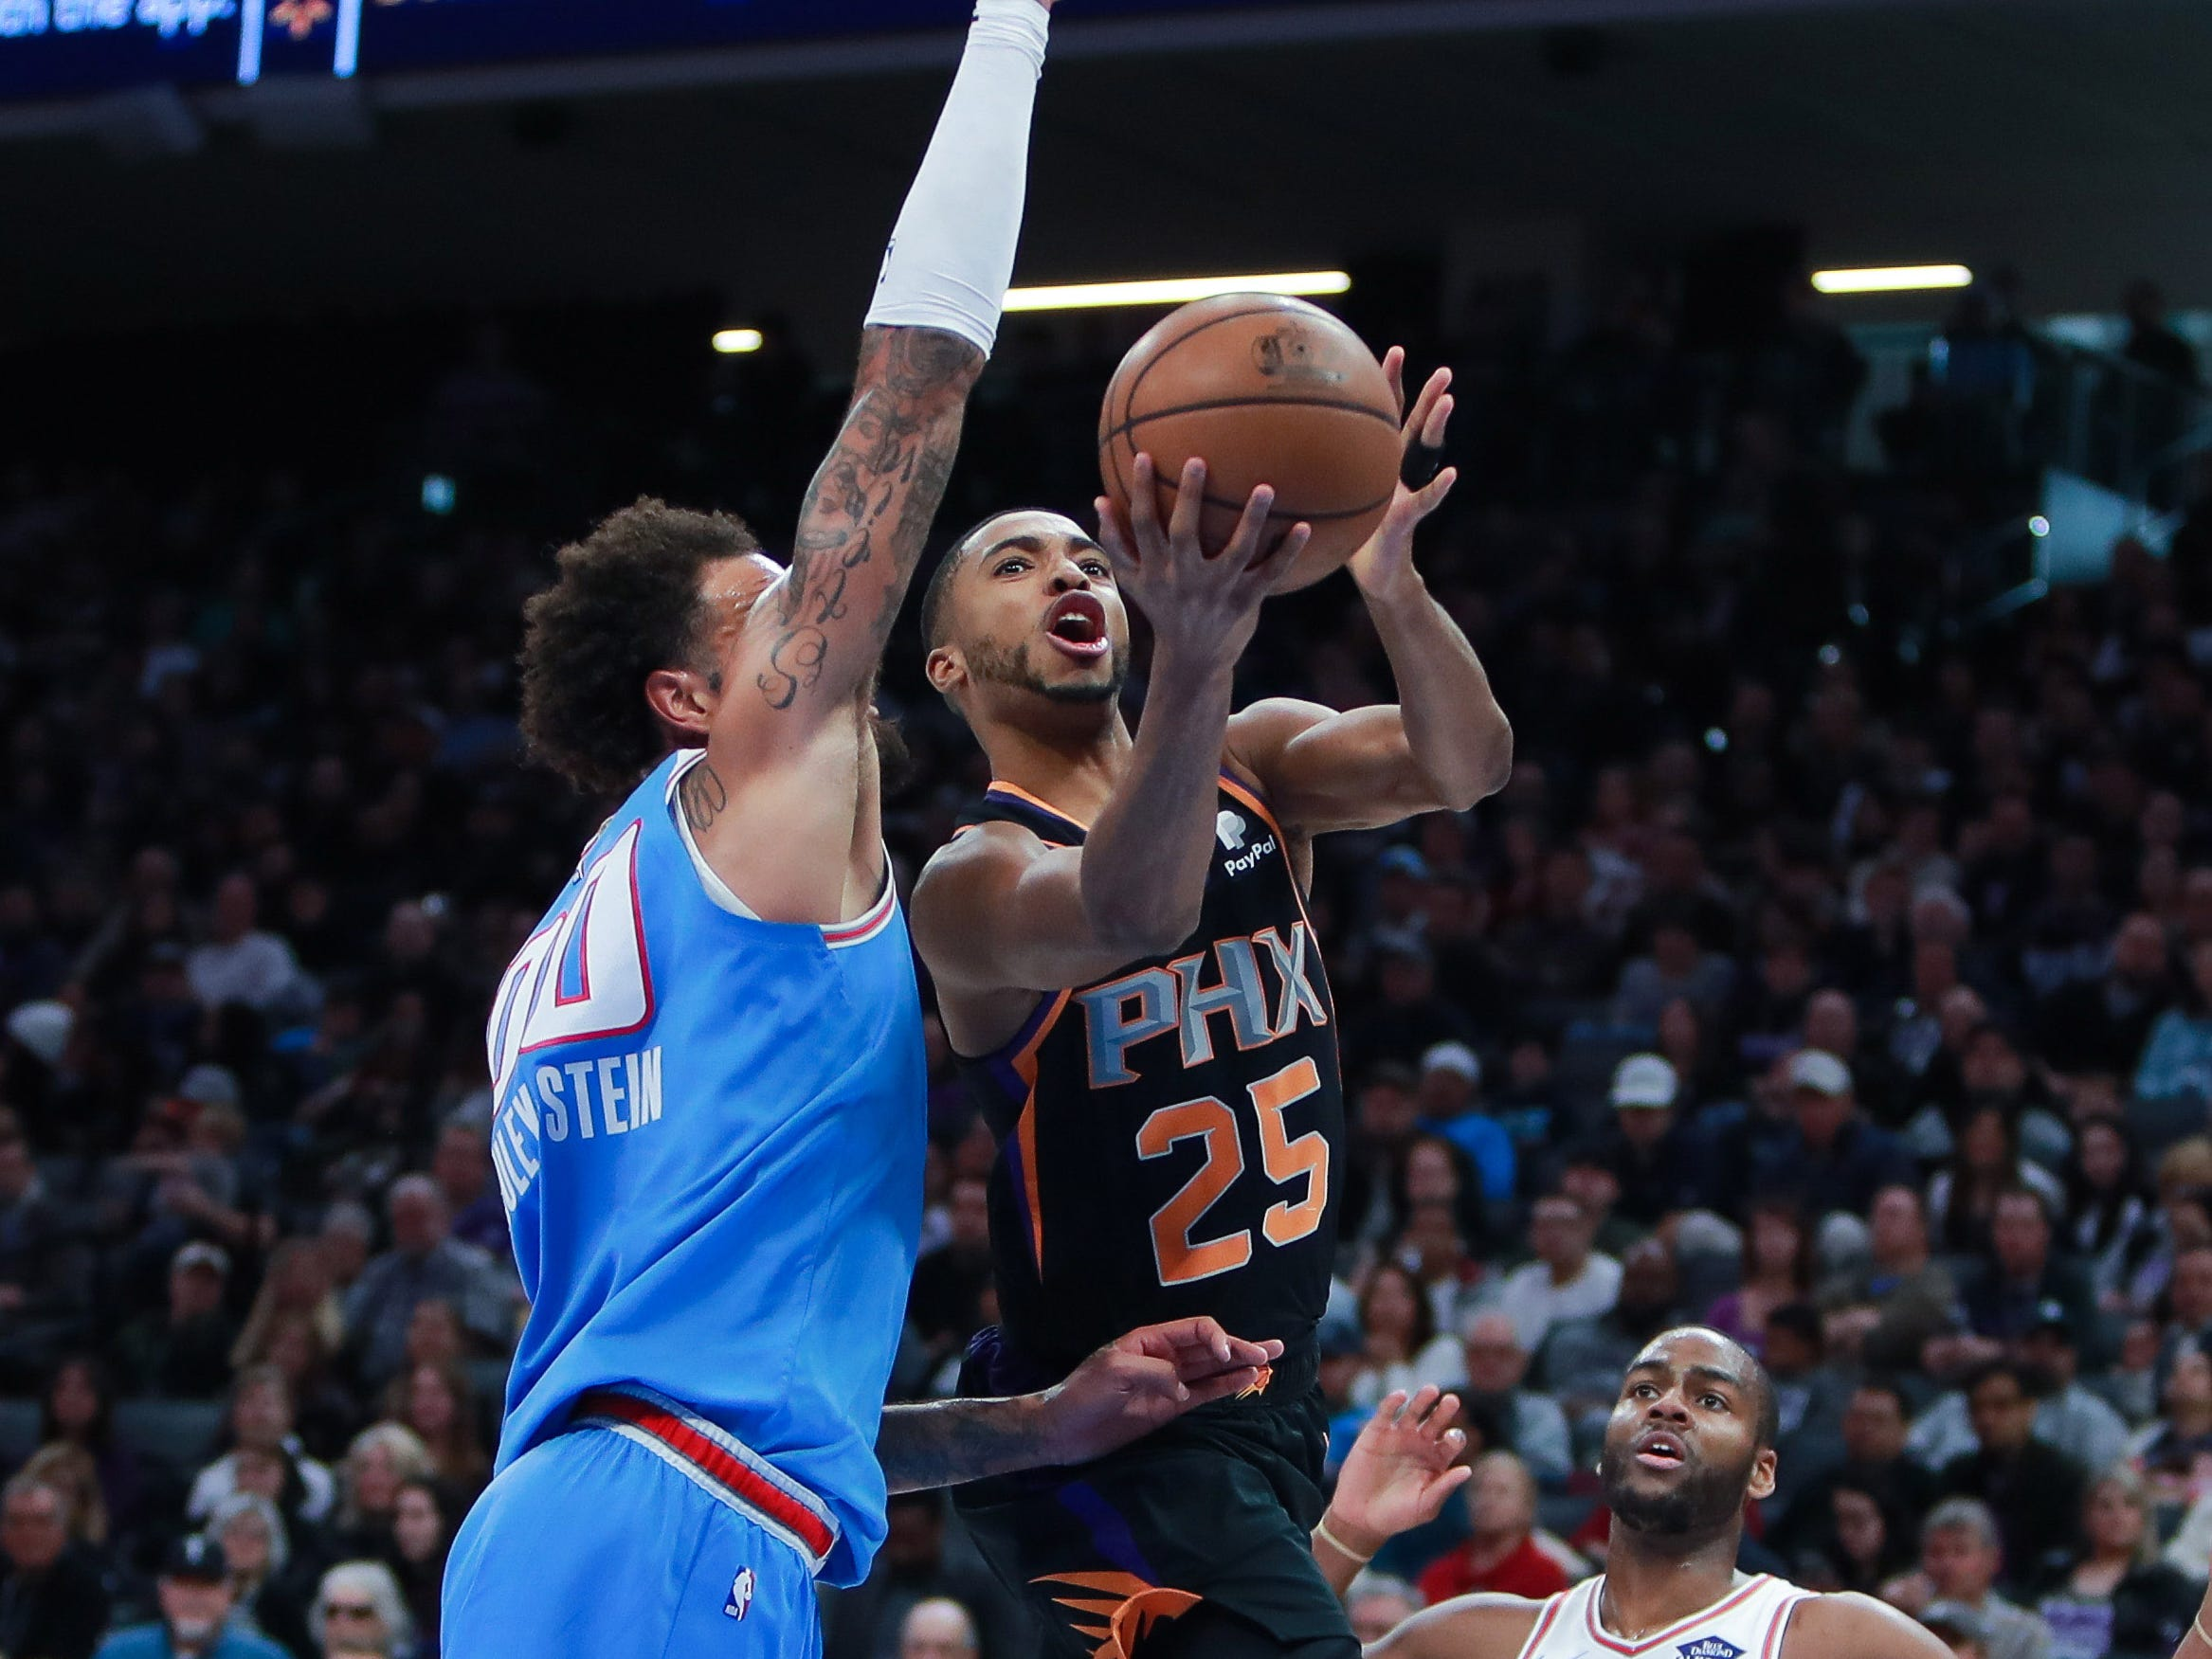 Feb 10, 2019; Sacramento, CA, USA; Phoenix Suns forward Mikal Bridges (25) shoots the ball over Sacramento Kings center Willie Cauley-Stein (00) during the second quarter at Golden 1 Center.